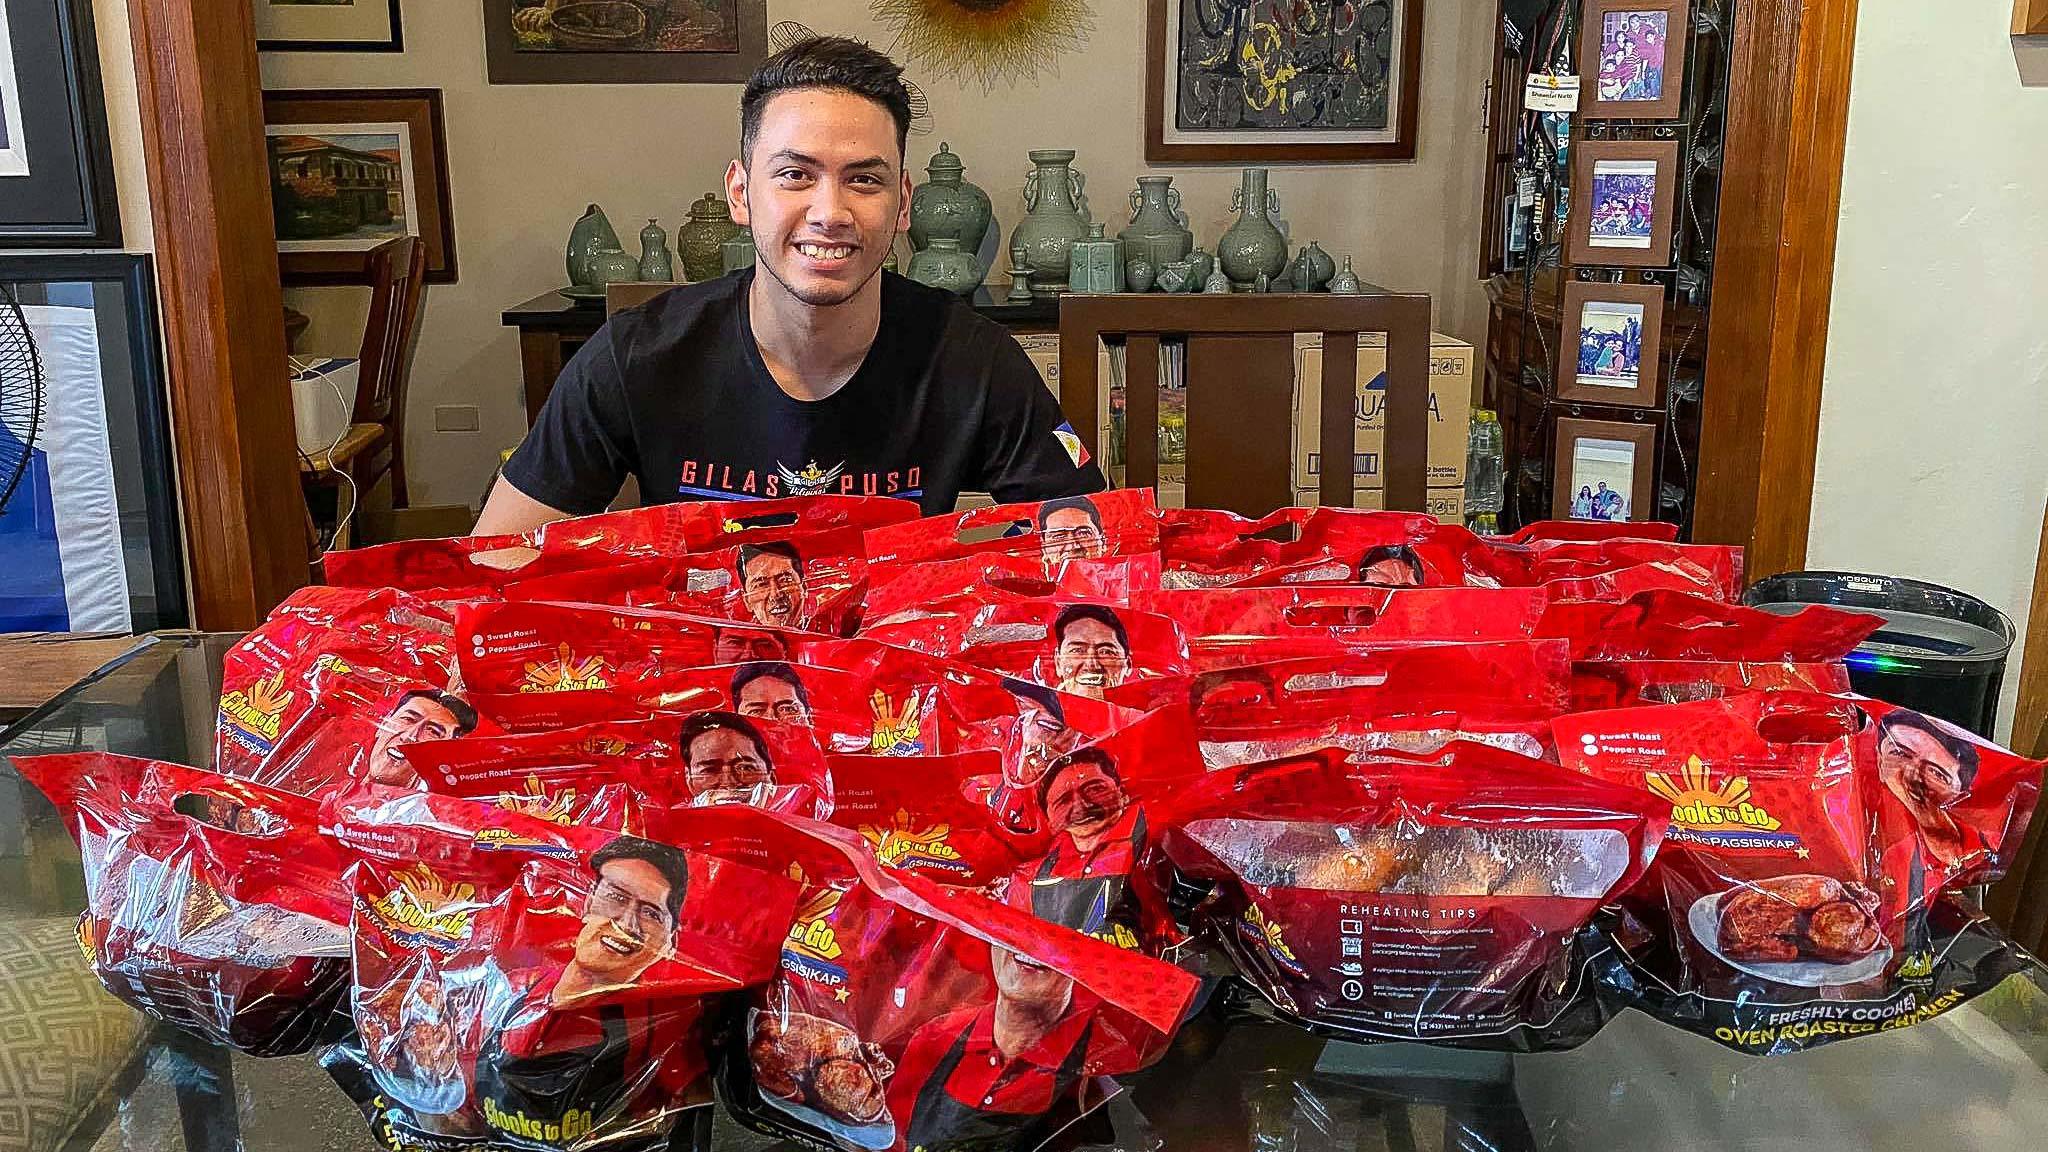 CTG-Covid-19-Food-Donation-Matt-Nieto-Cainta-Hospital-6 Matt Nieto gathers help for Cainta frontliners Basketball Gilas Pilipinas News  - philippine sports news